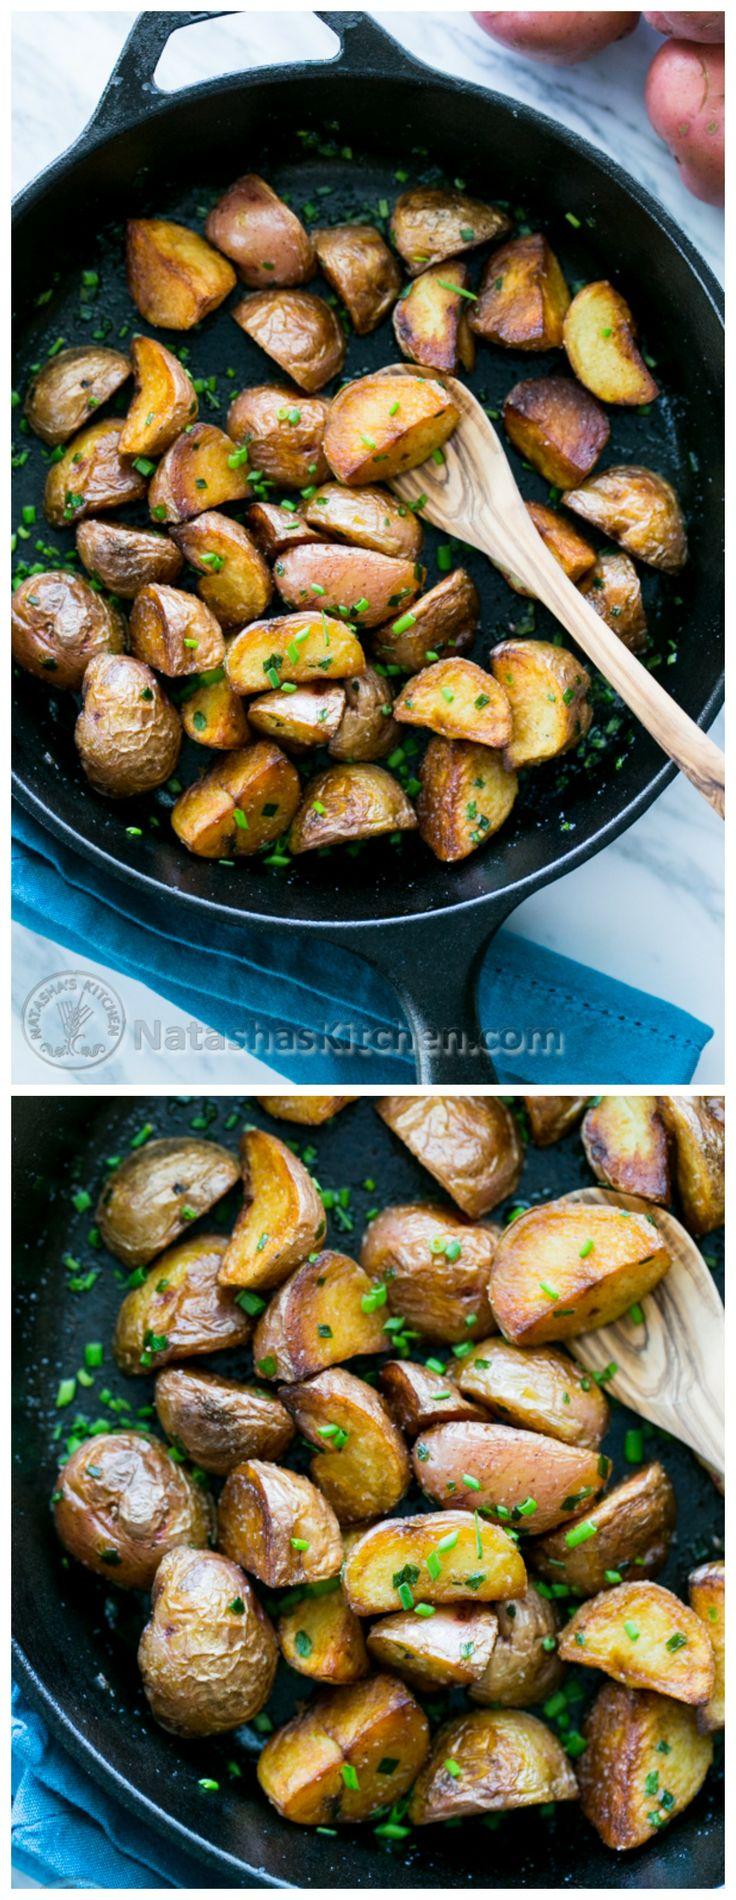 Simple and Crisp Sautéed Baby Red potatoes. @natashaskitchen